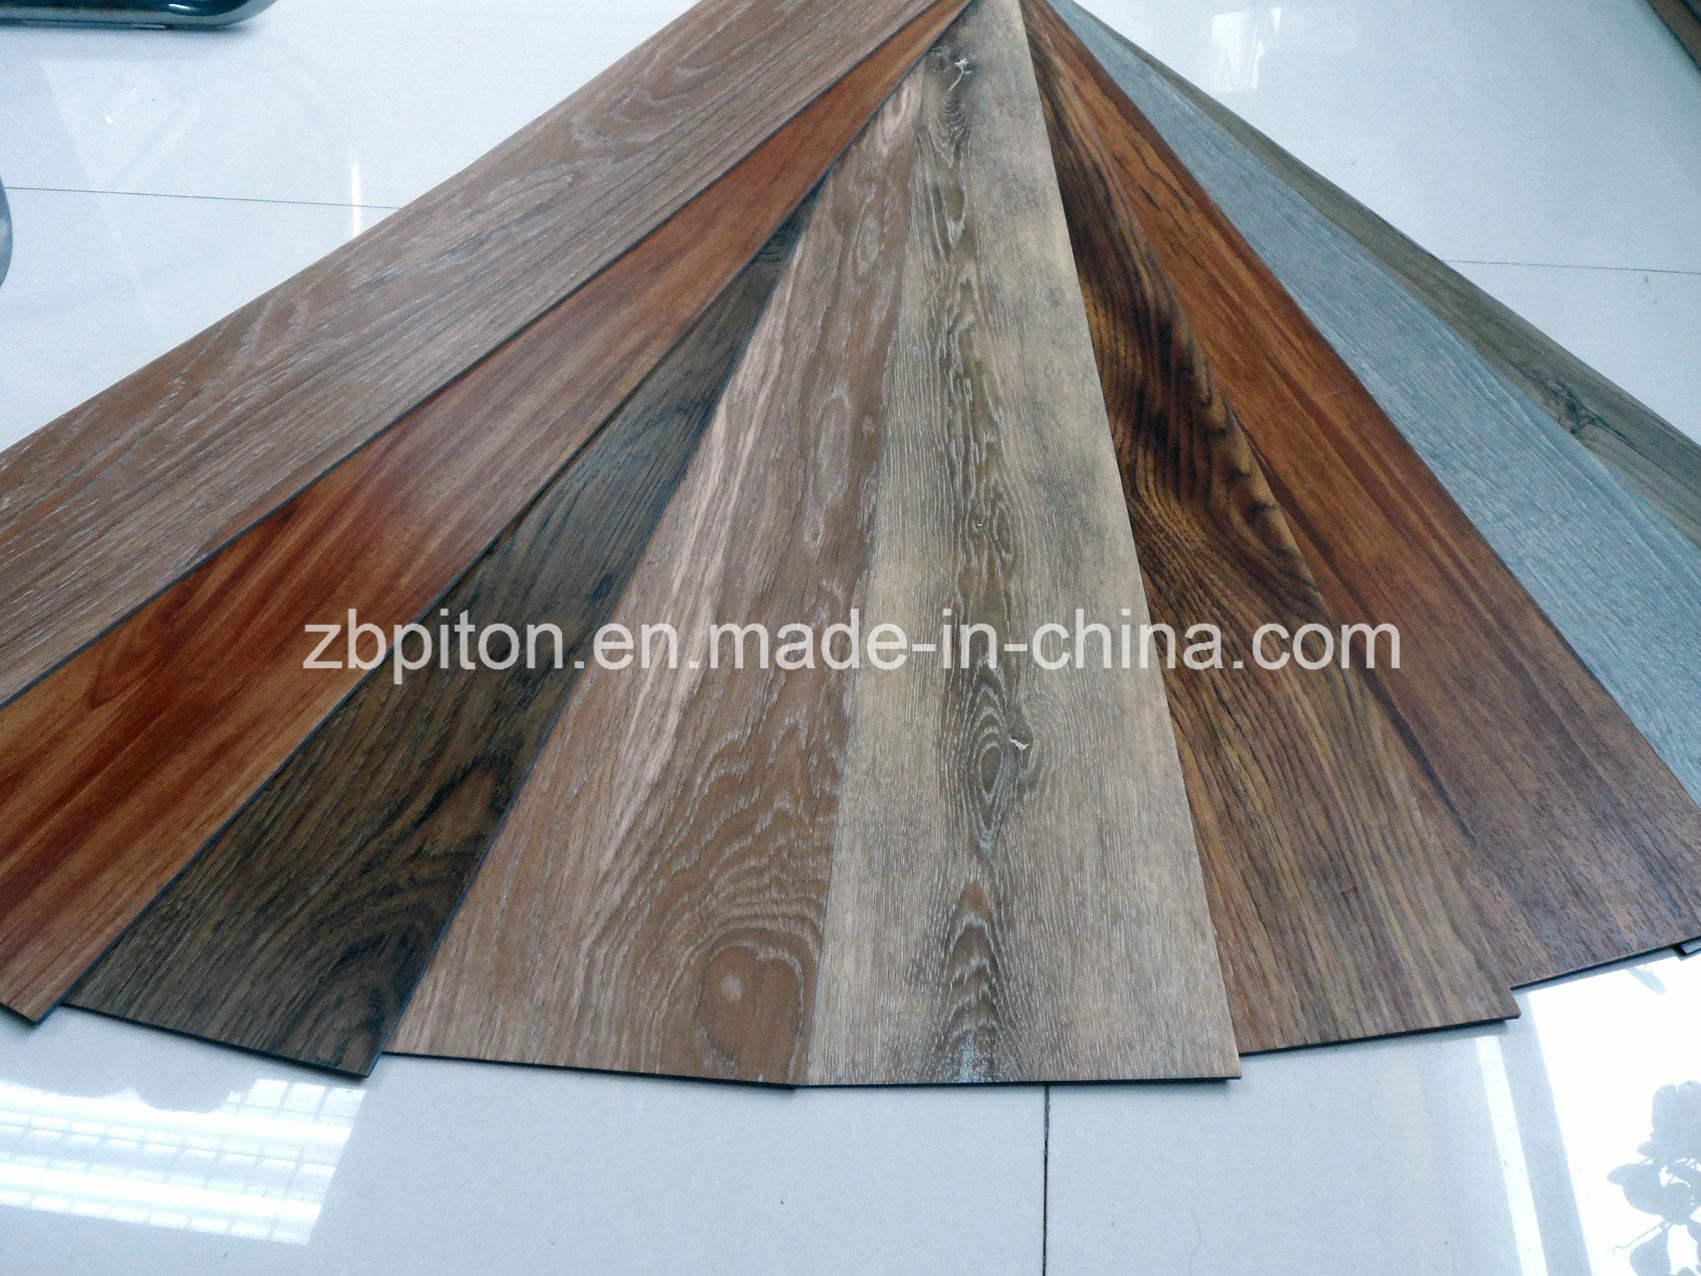 China best price soundproof wood look pvc floor tile photos best price soundproof wood look pvc floor tile doublecrazyfo Choice Image